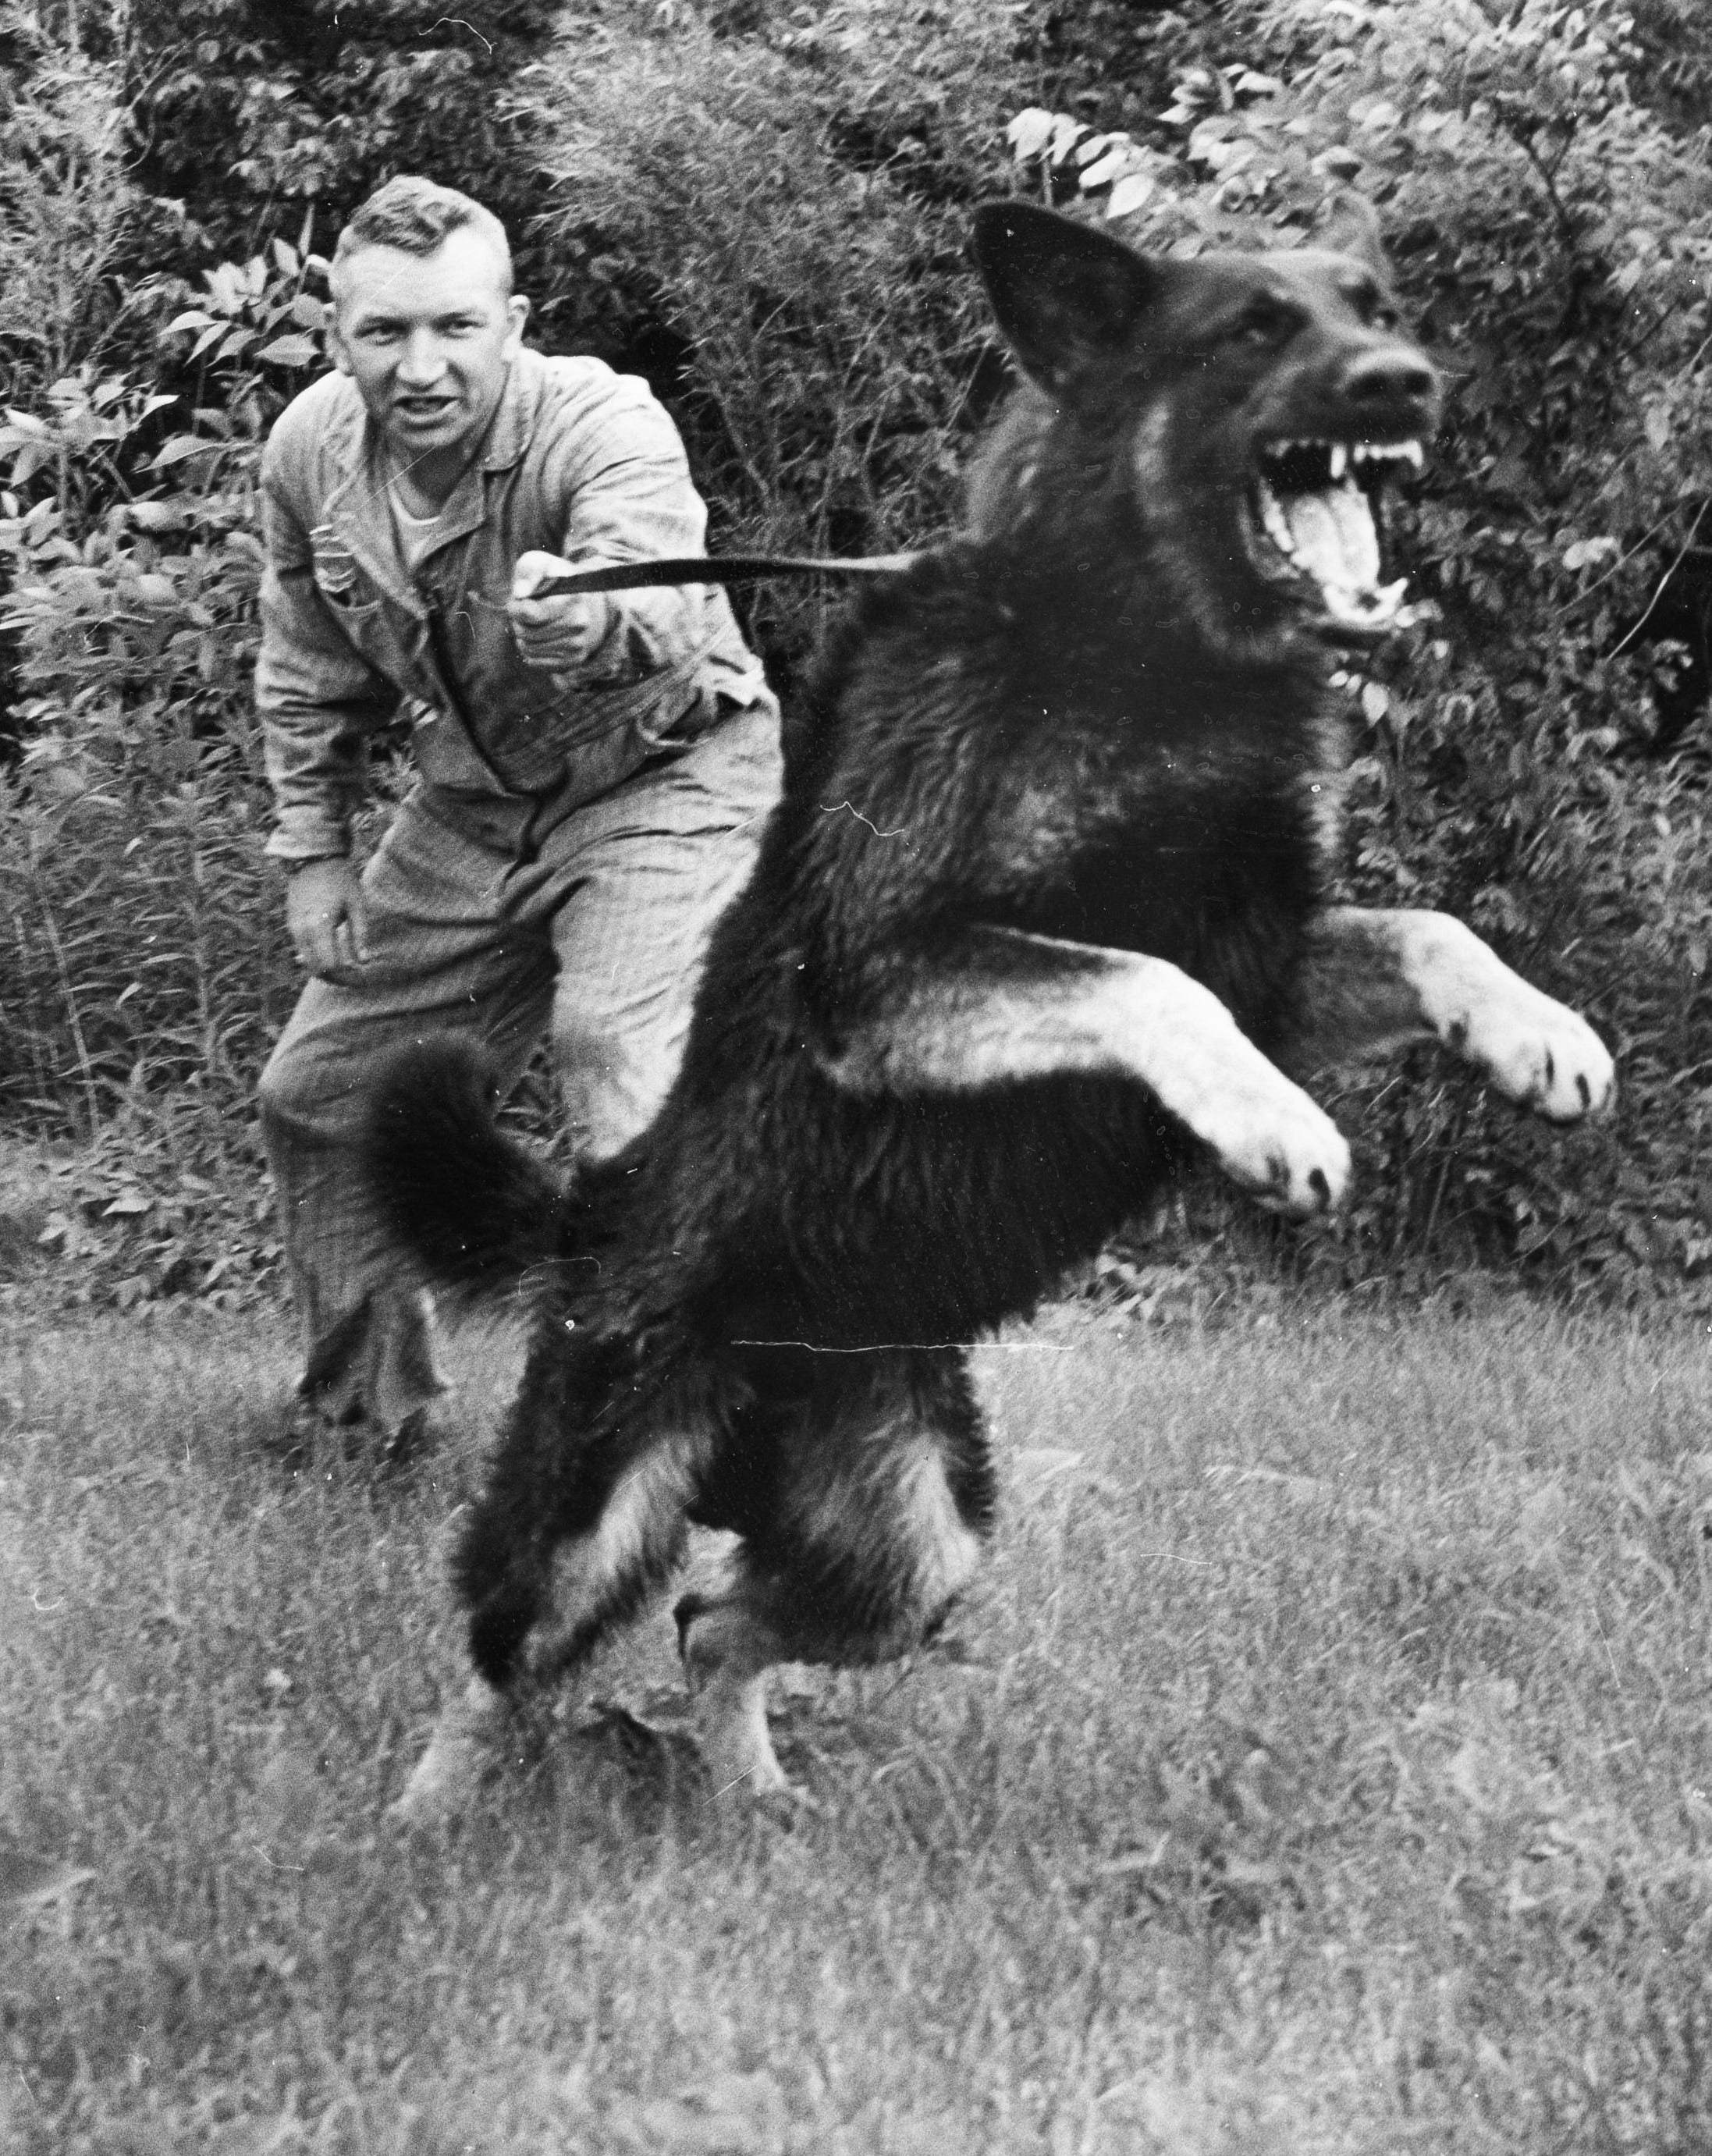 Patrolman William C. Ball with his police dog Thor.